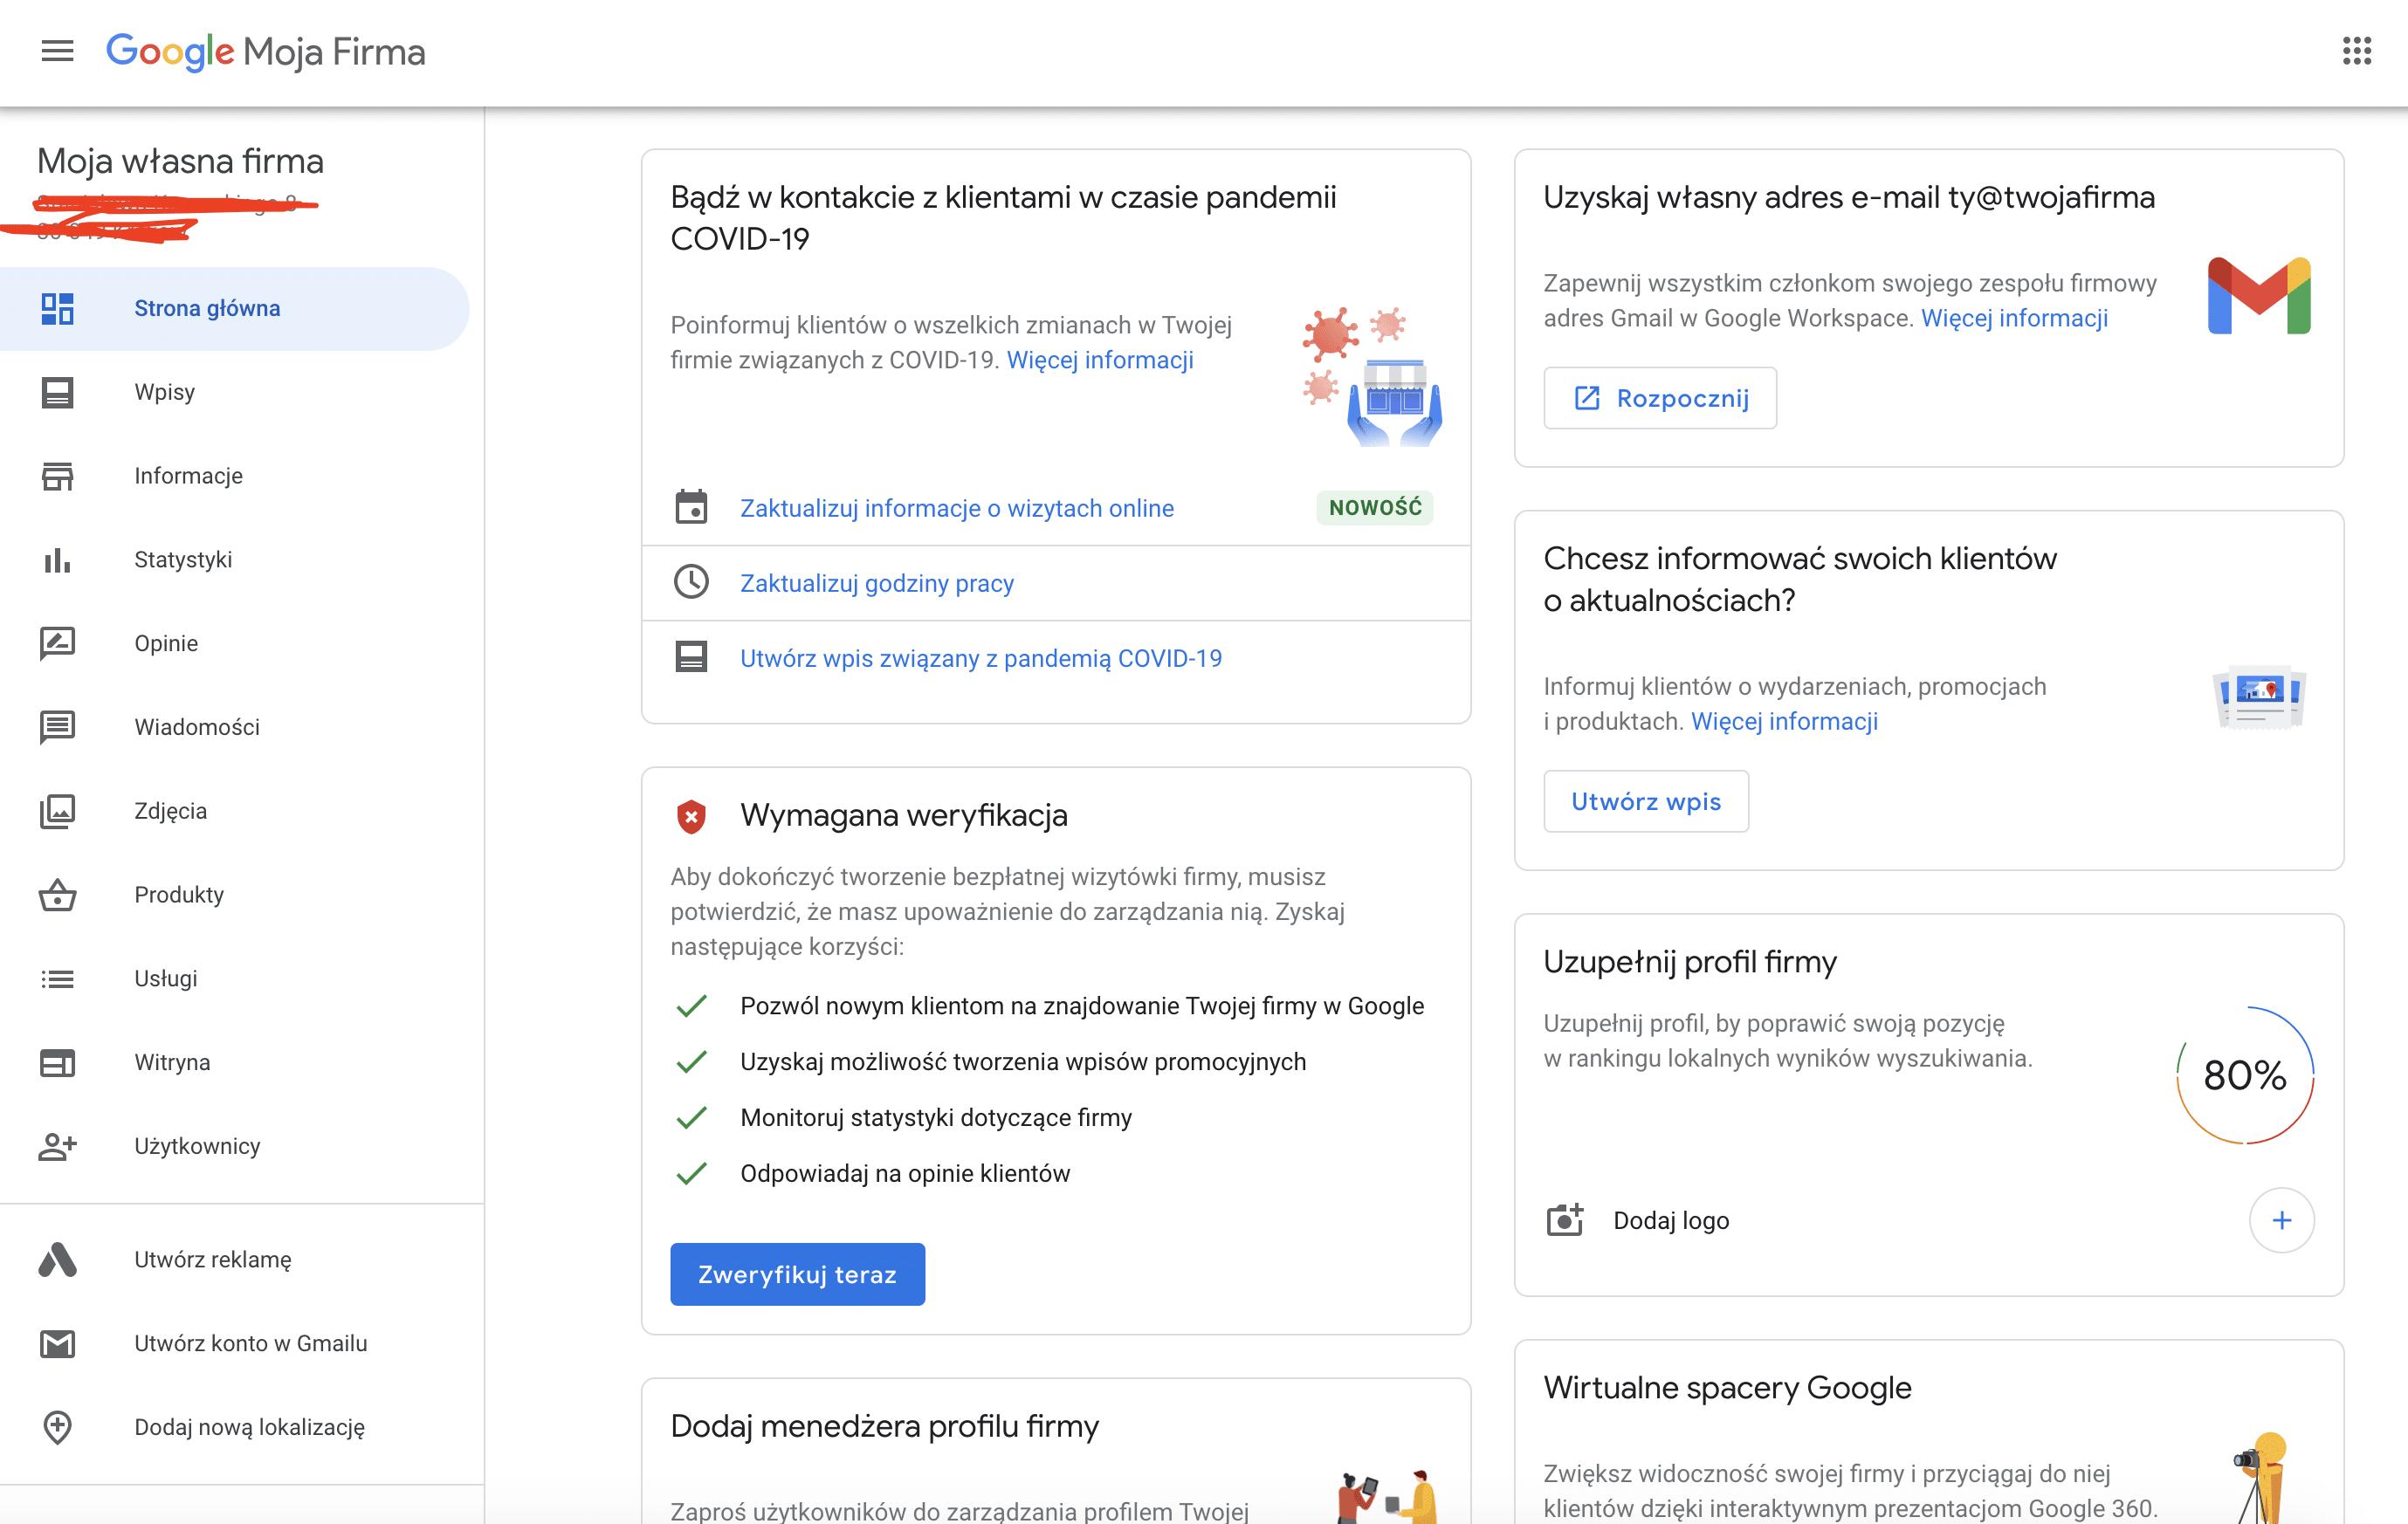 Google Moja Firma -widok panelu